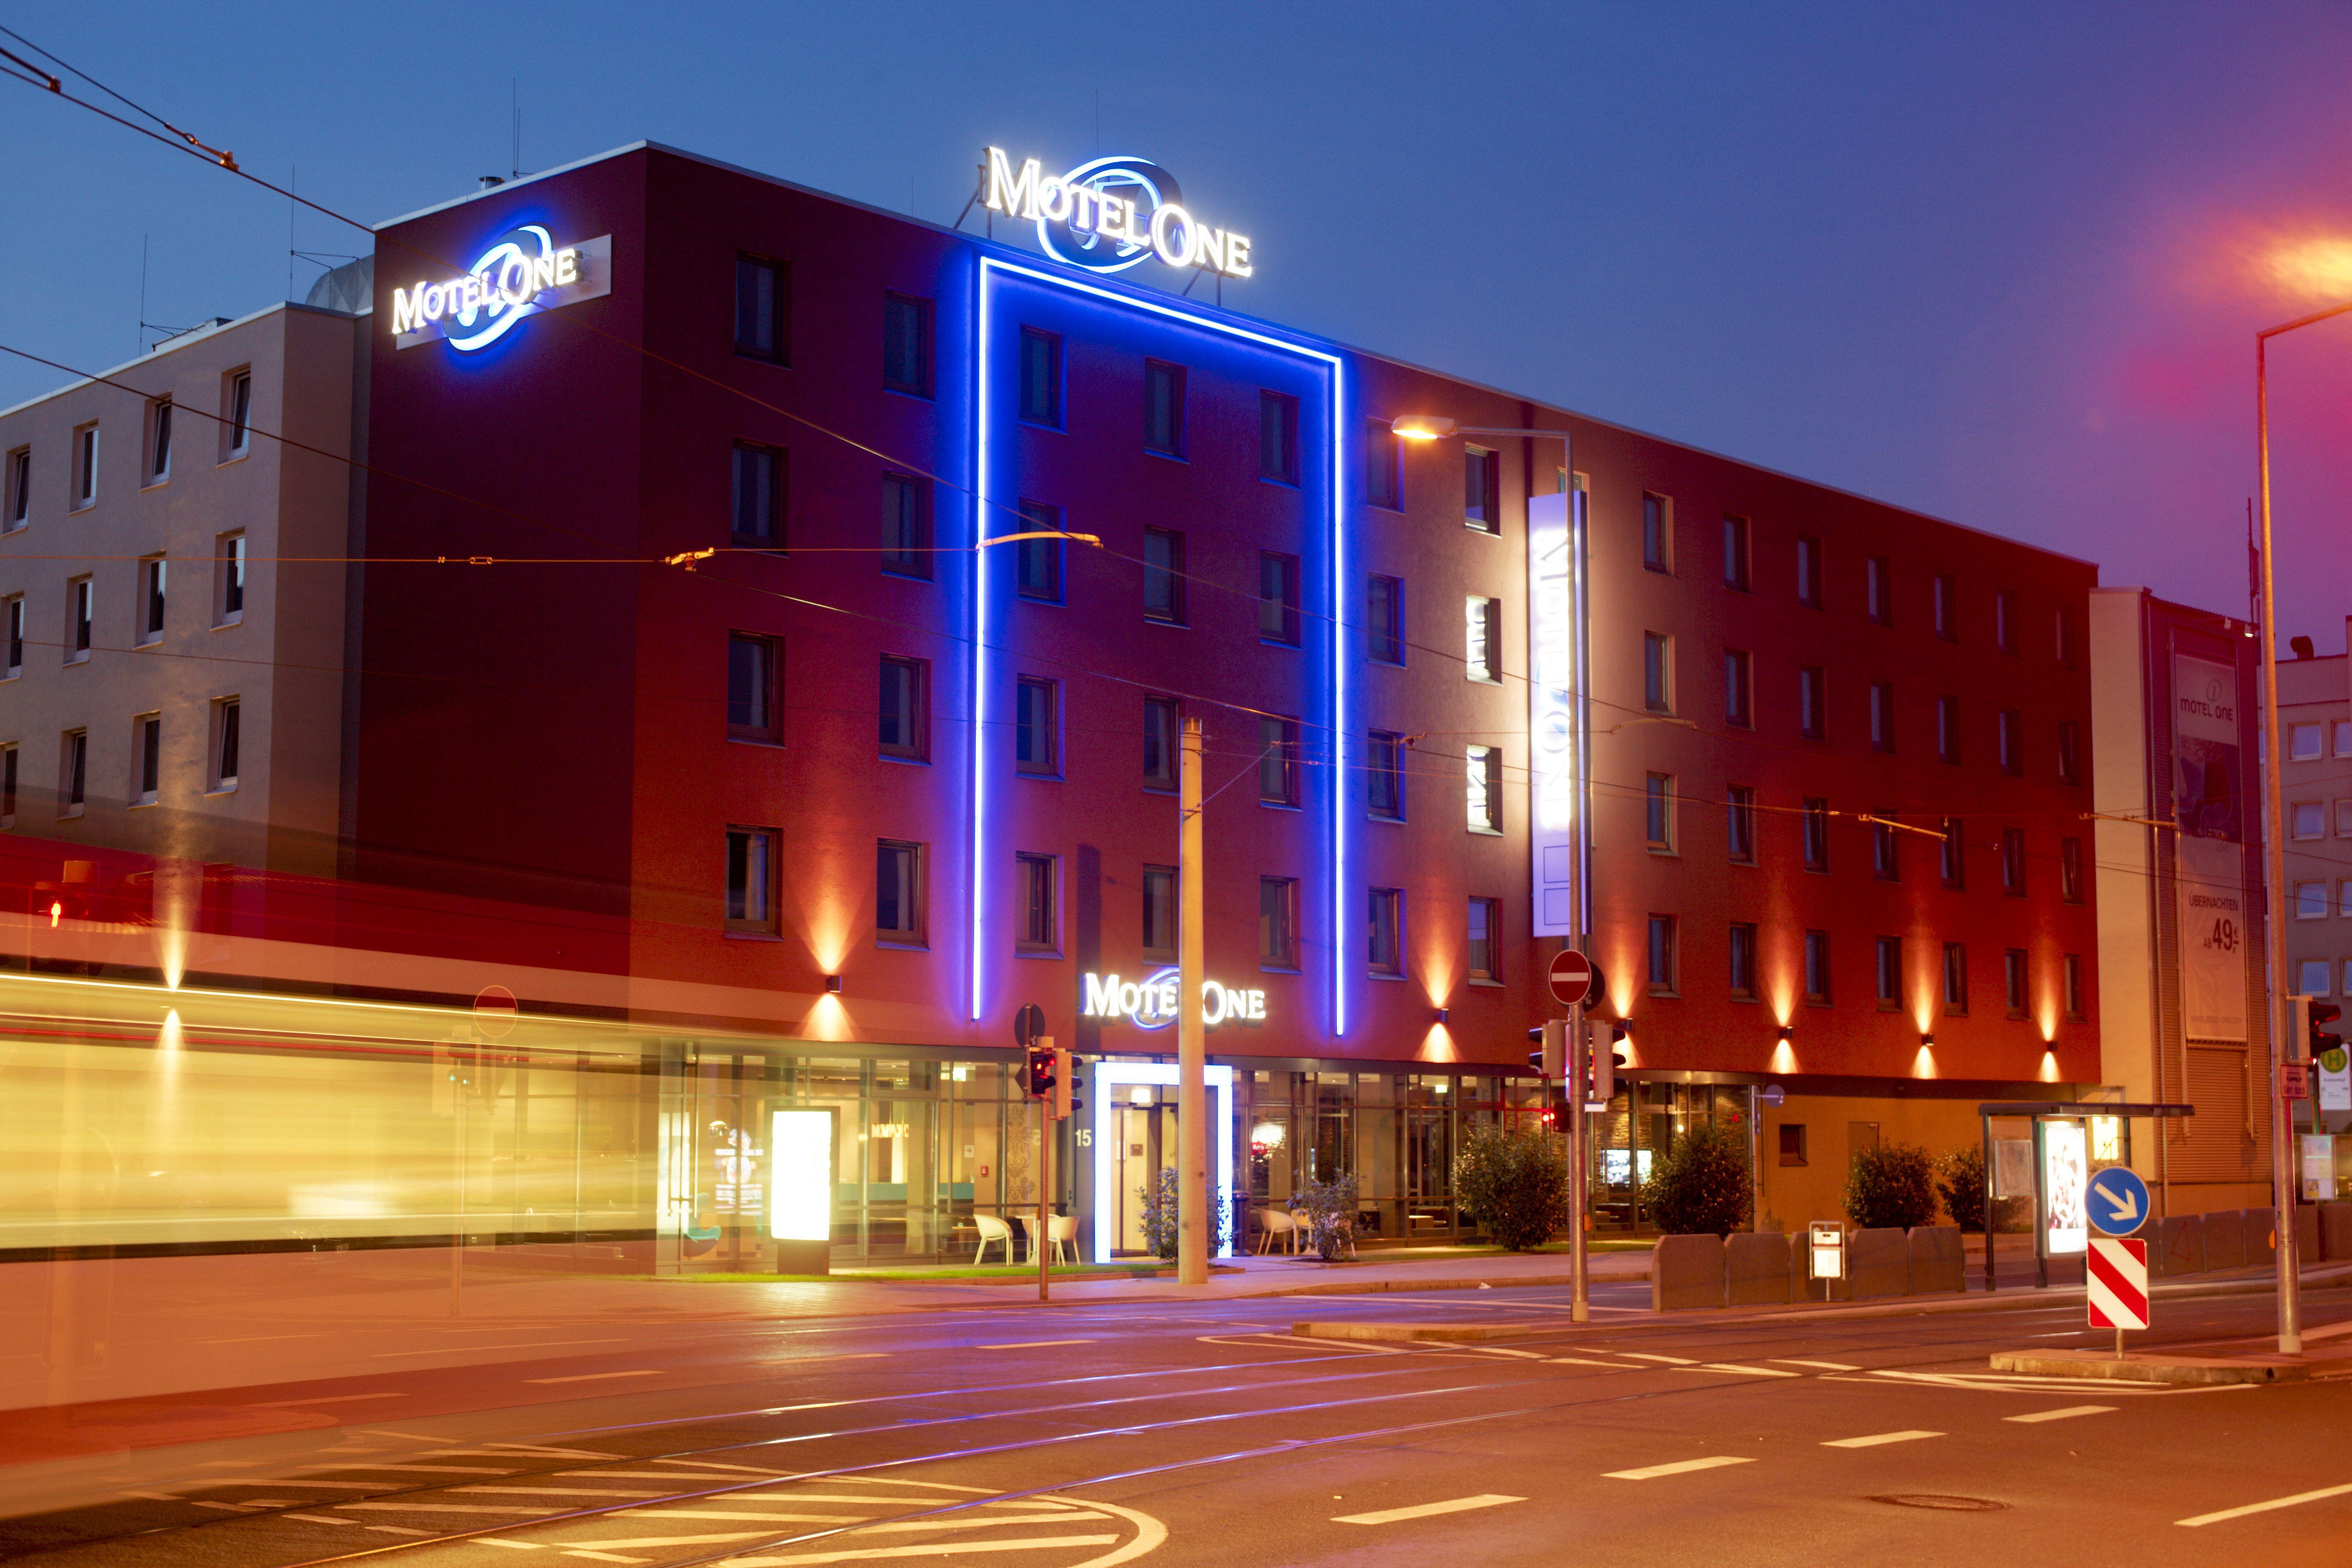 Hotel Motel One Nürnberg-Plärrer